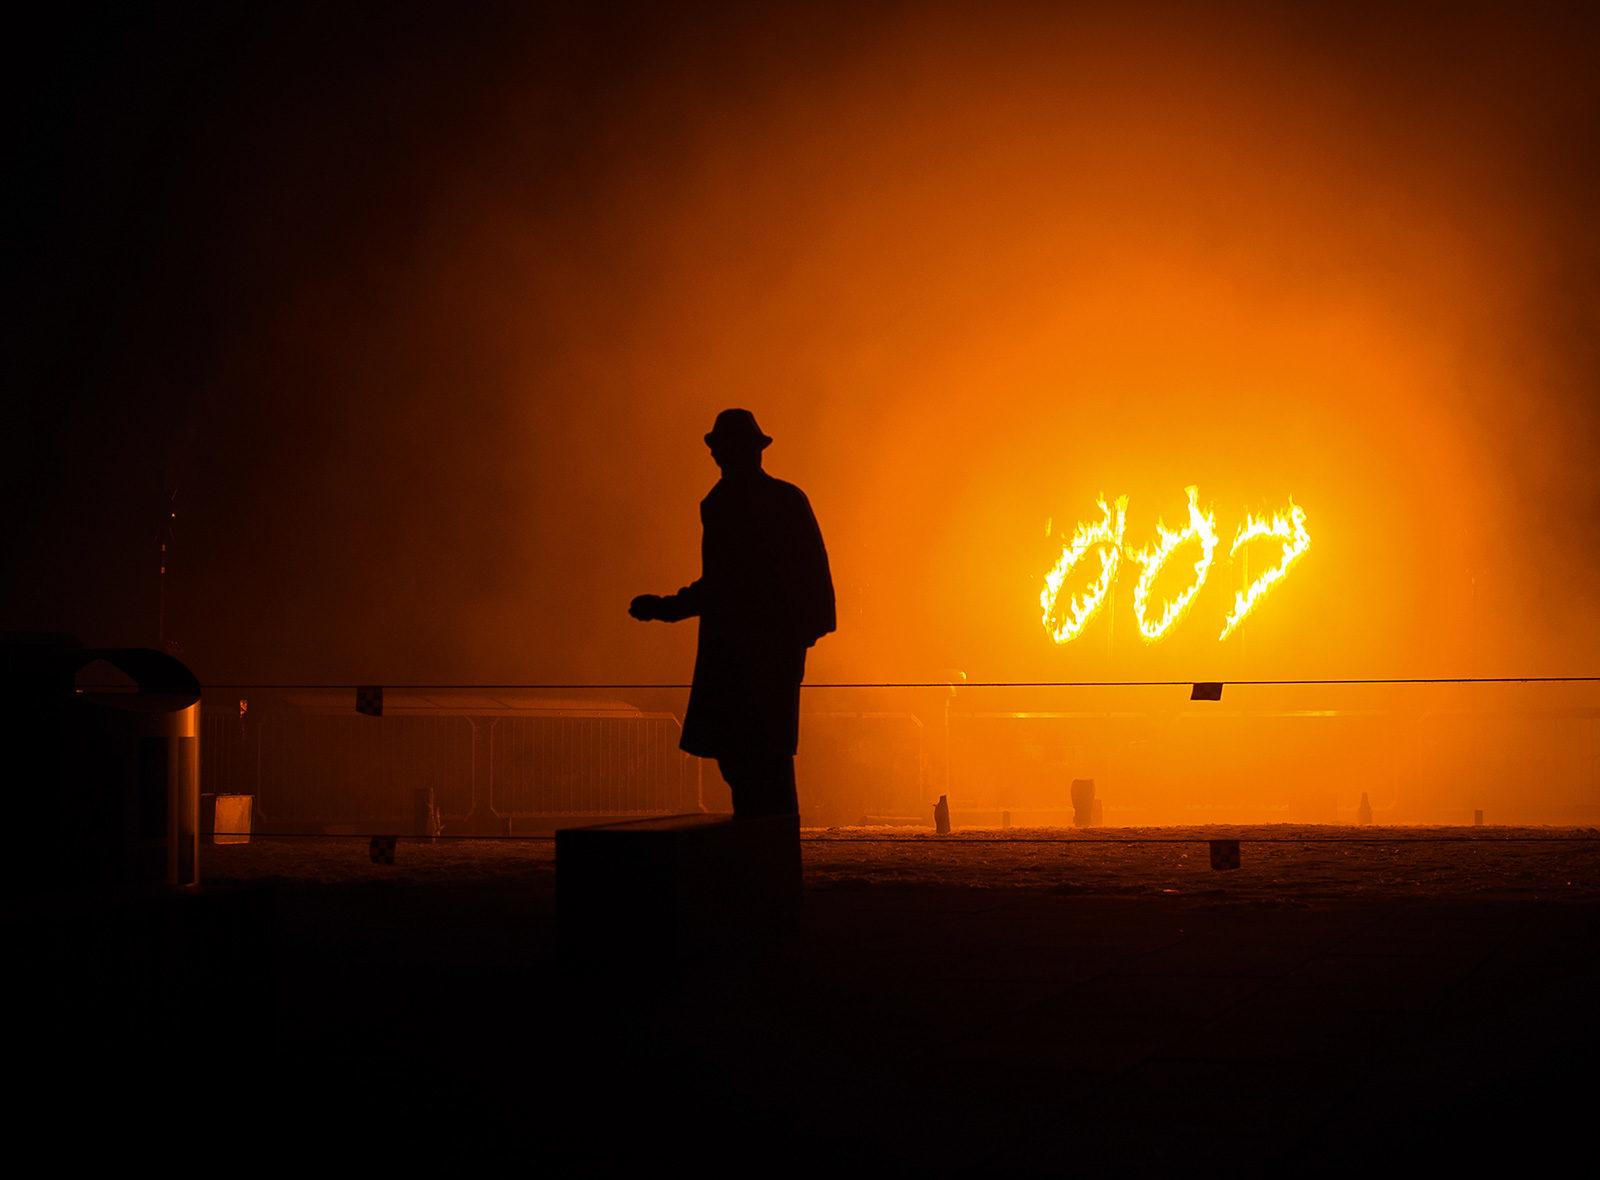 James Bonnd 007, Schilthorn